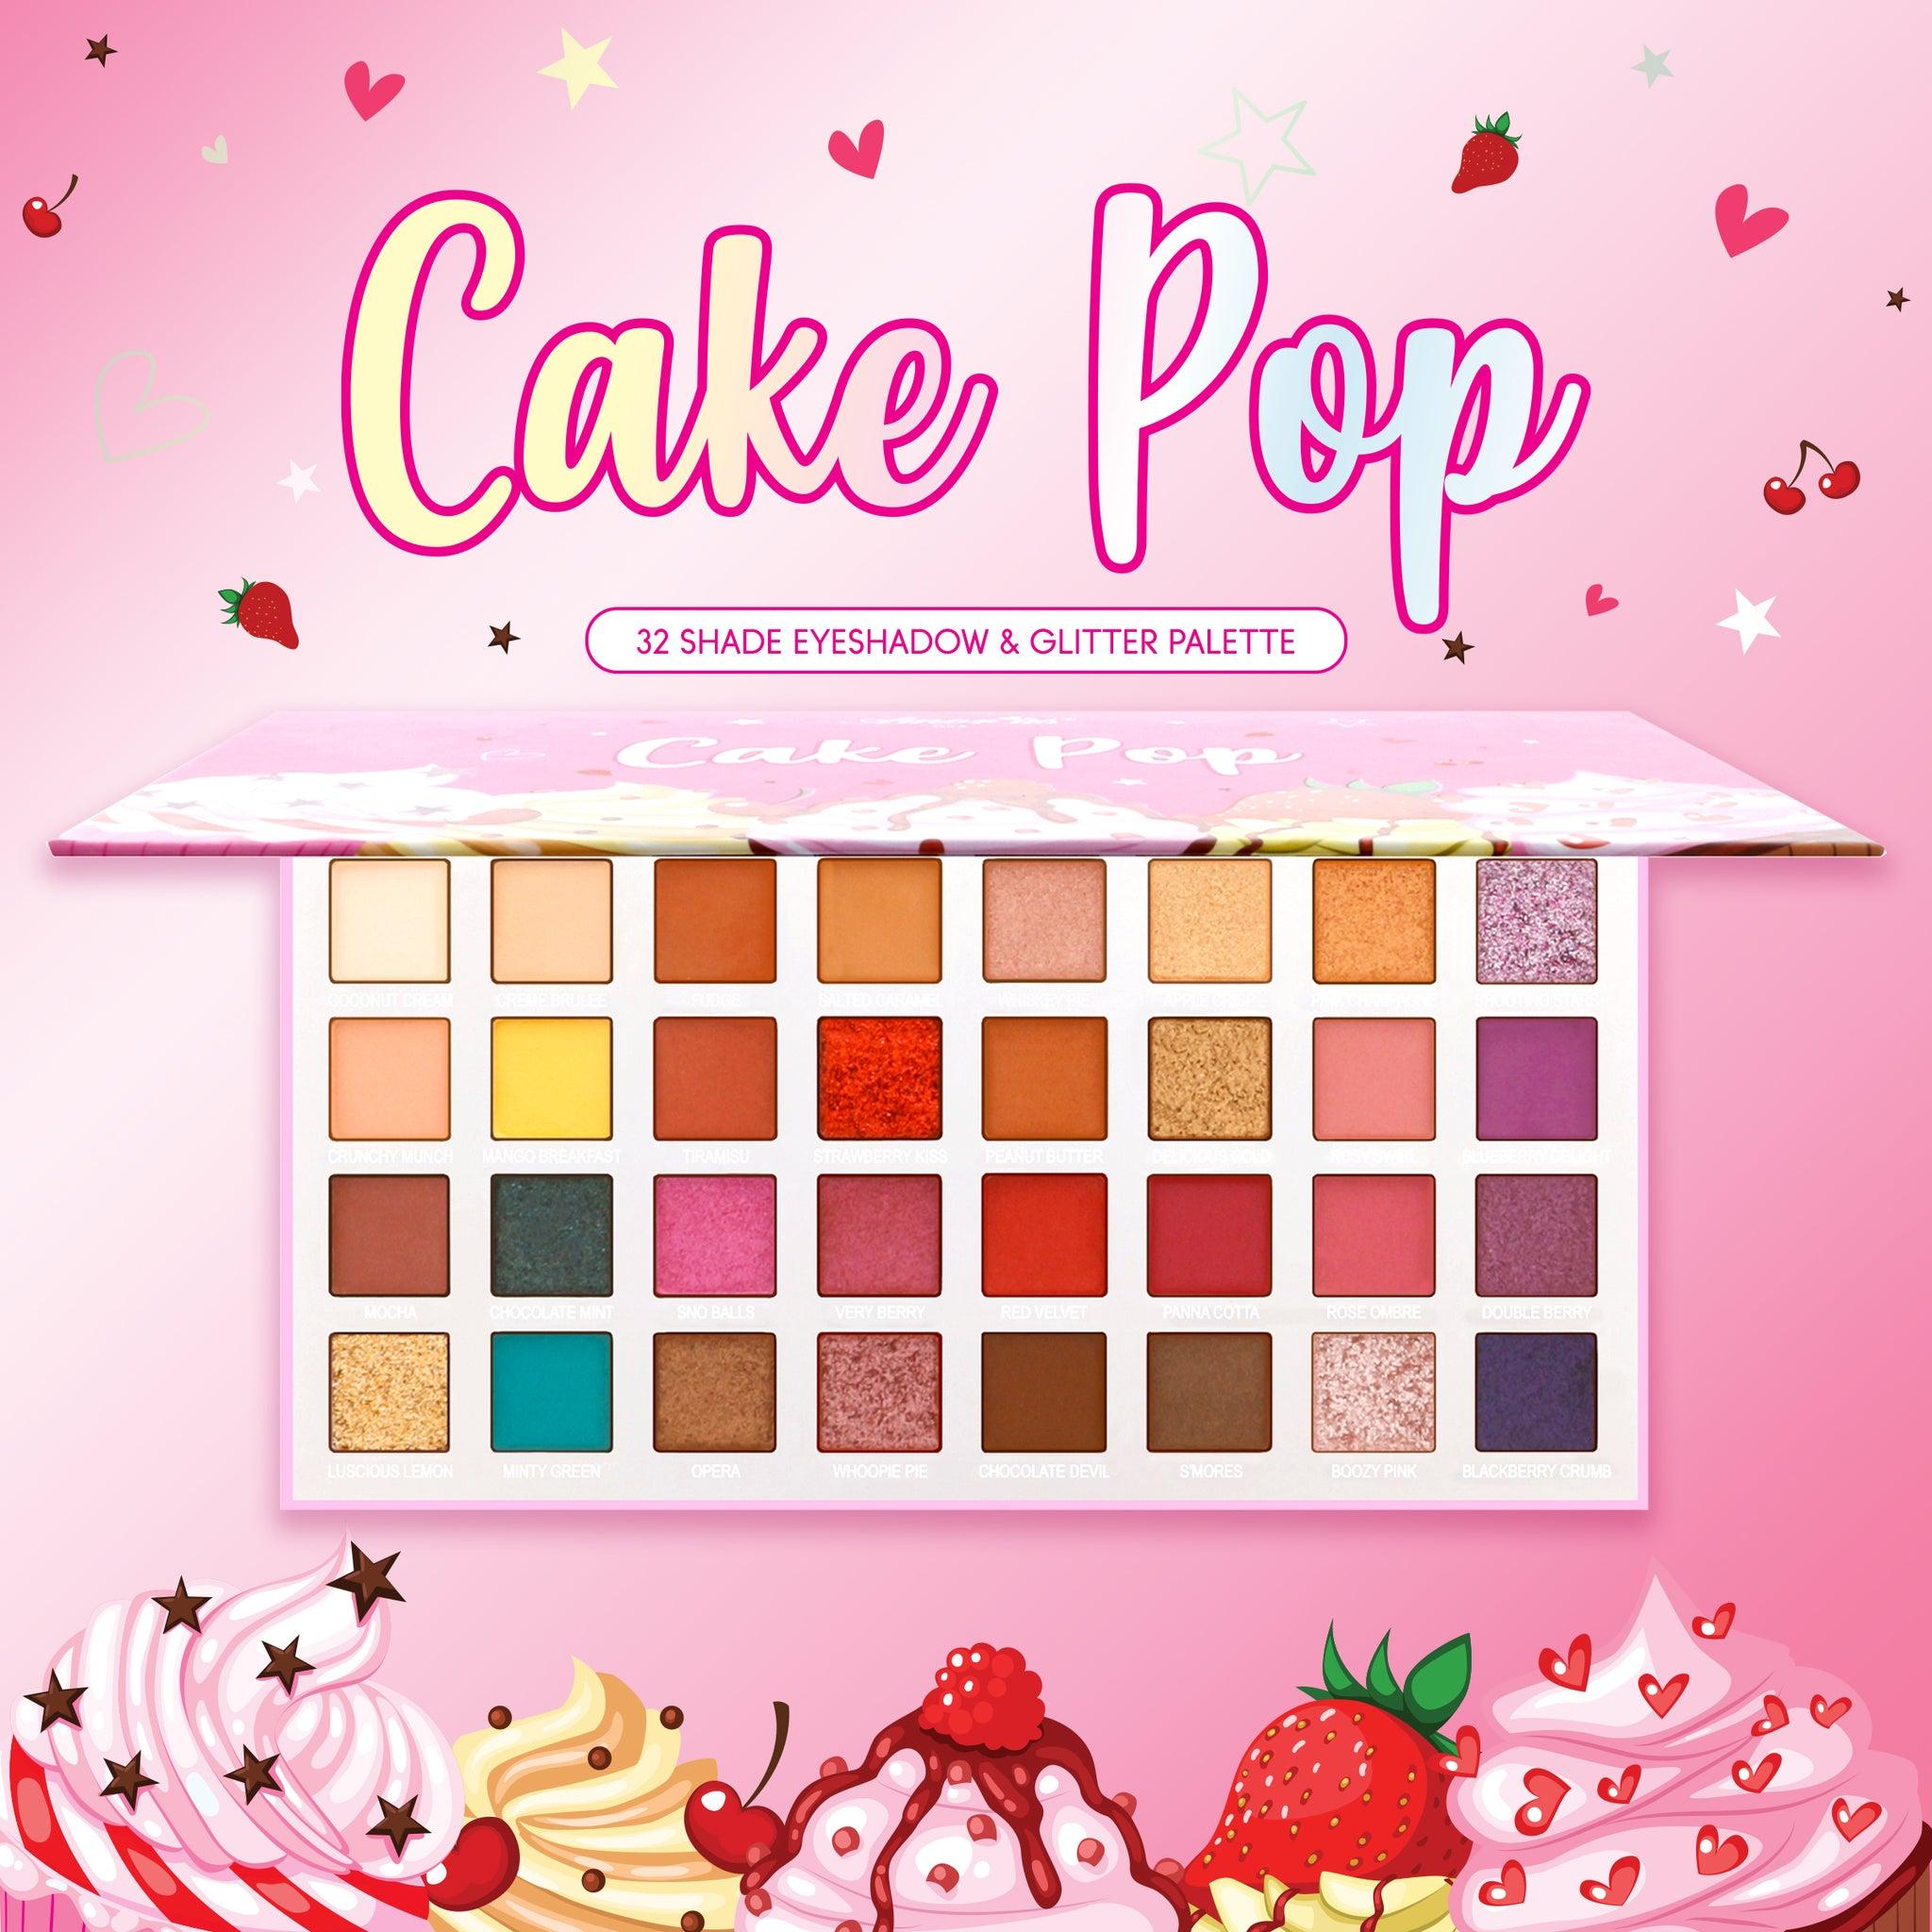 null - Cake Pop - Eyeshadow & Glitter Palette